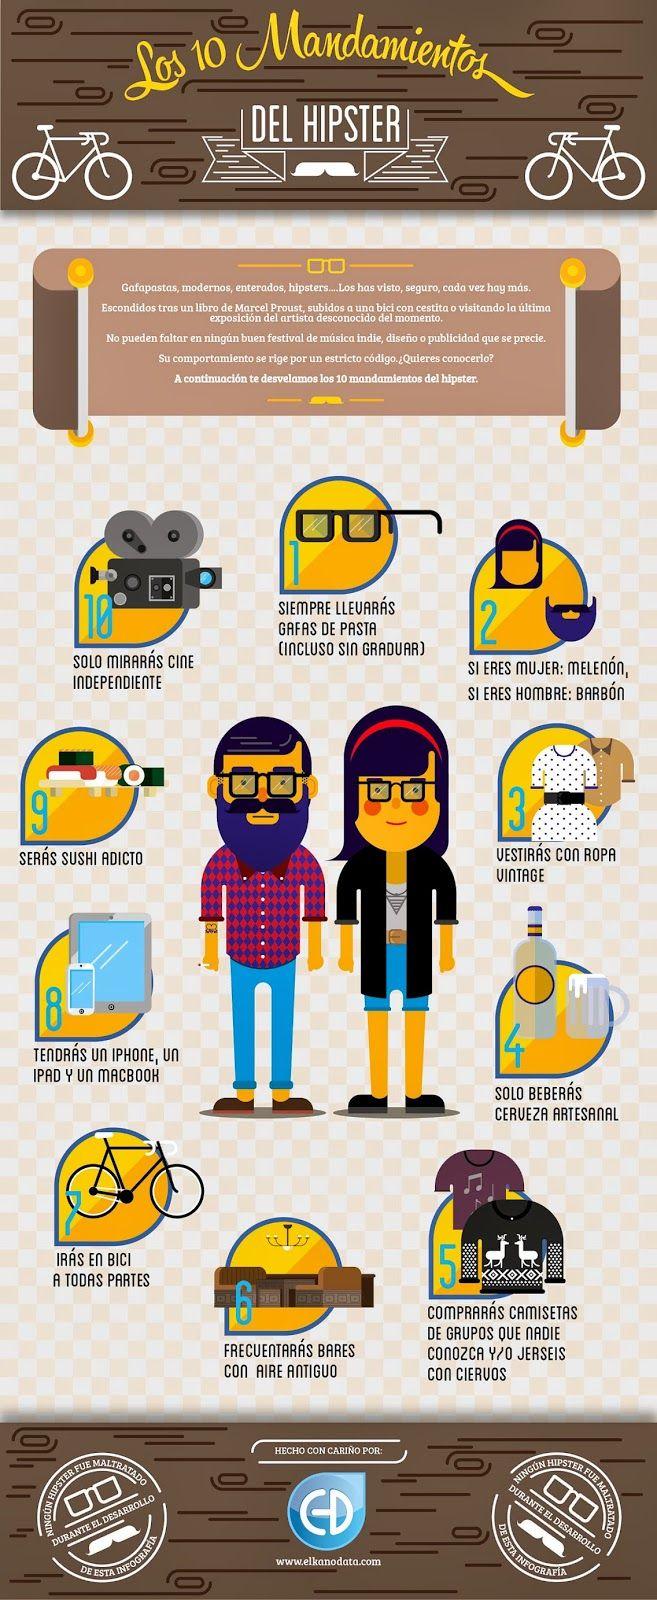 #Infografia #Curiosidades Los 10 mandamientos del Hipster. #TAVnews